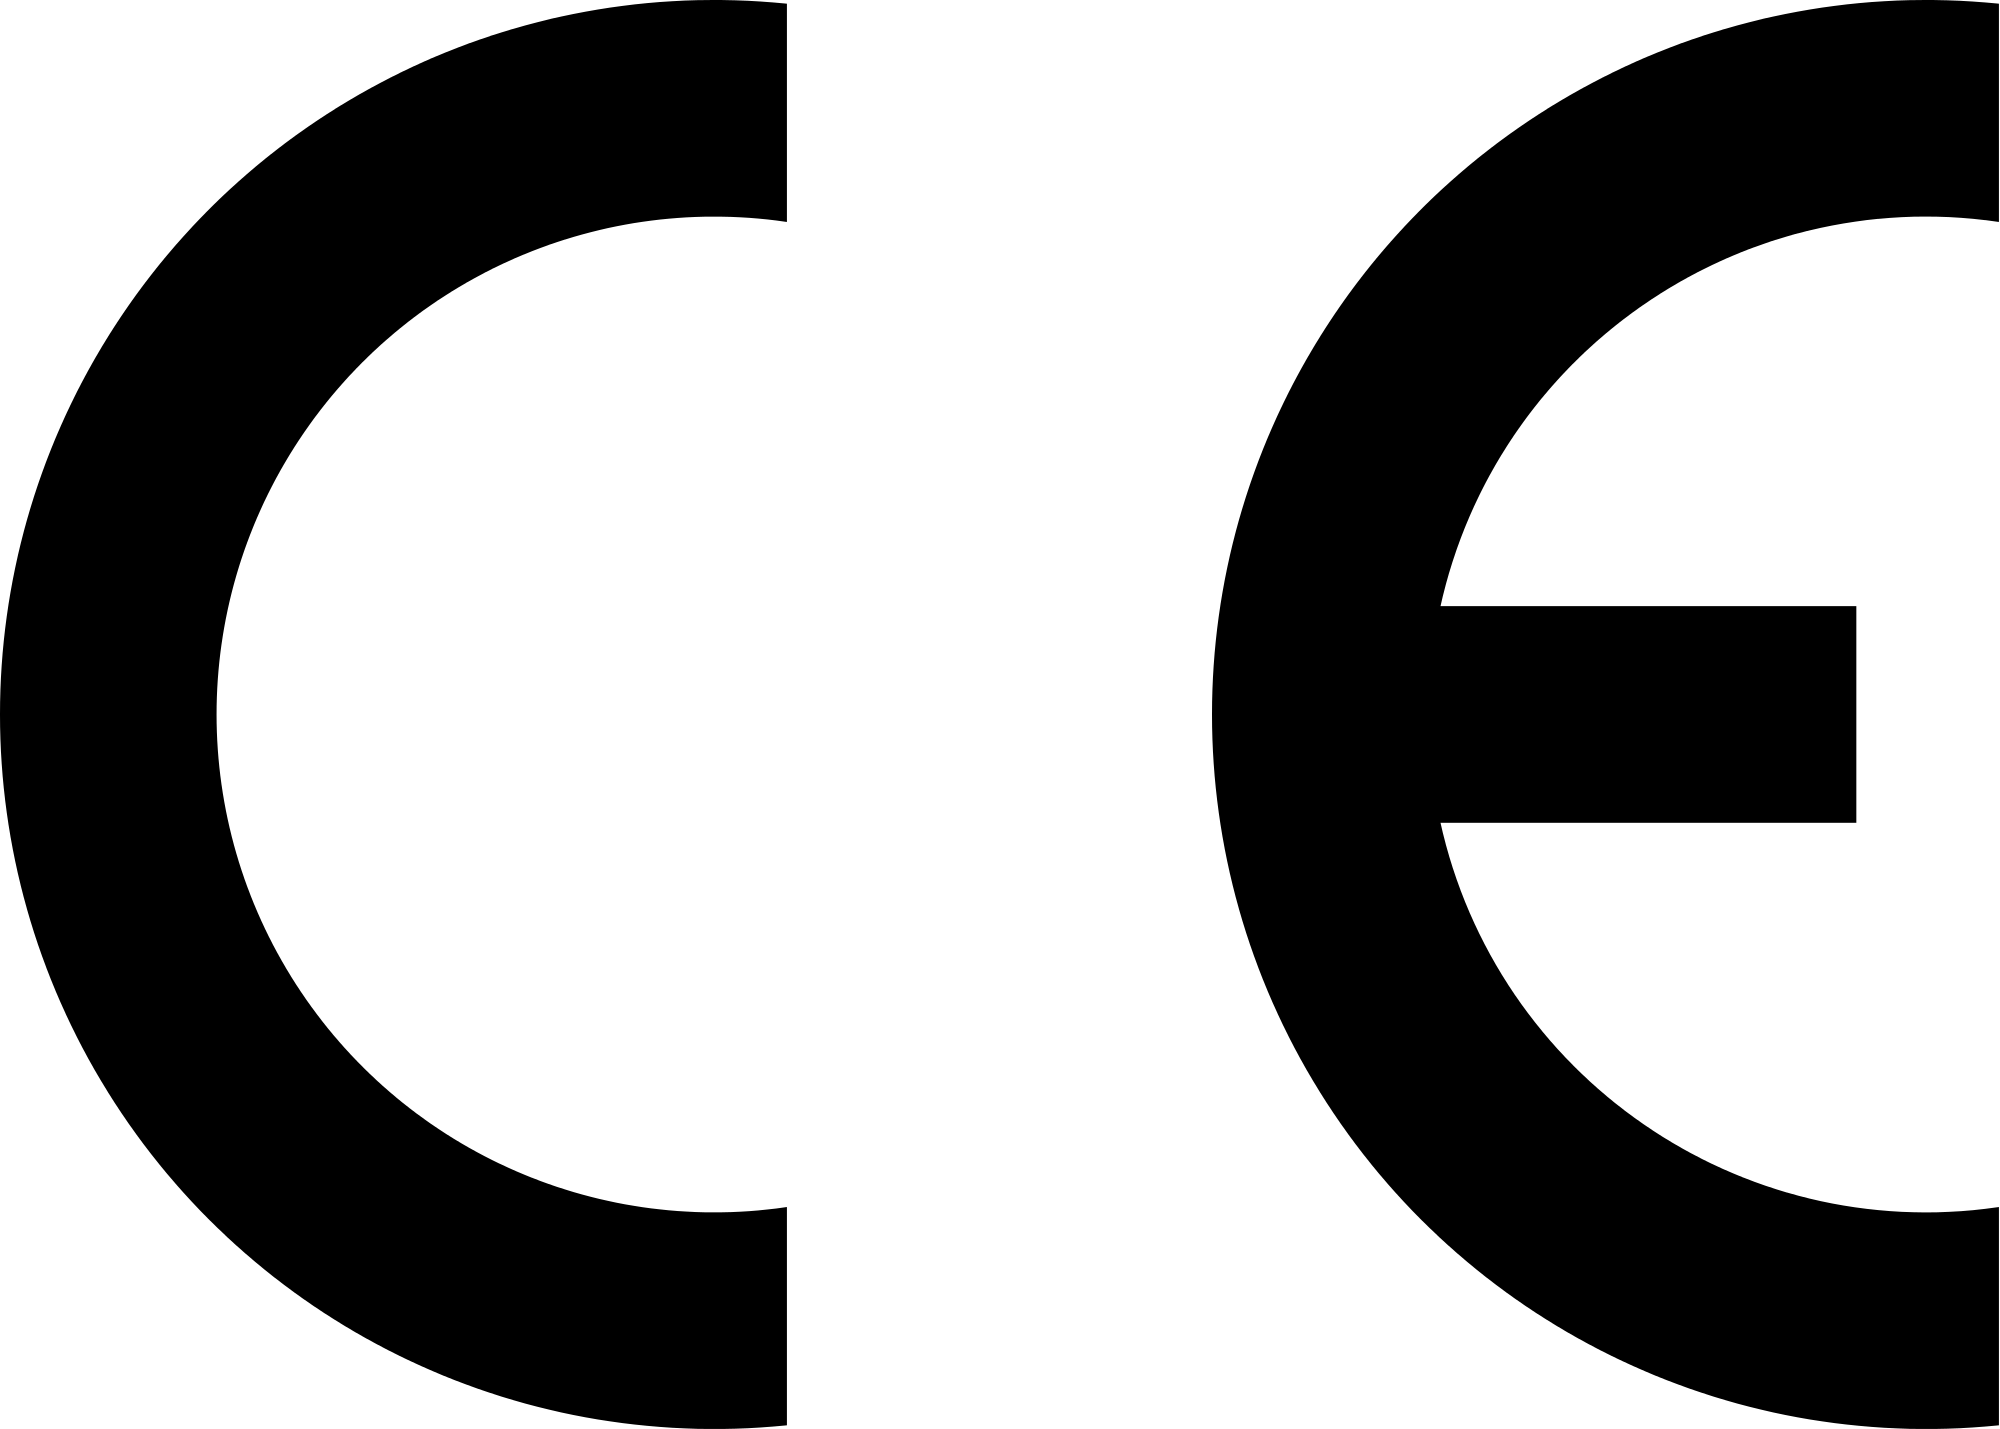 Conformit%C3%A9_Europ%C3%A9enne_(logo)-s